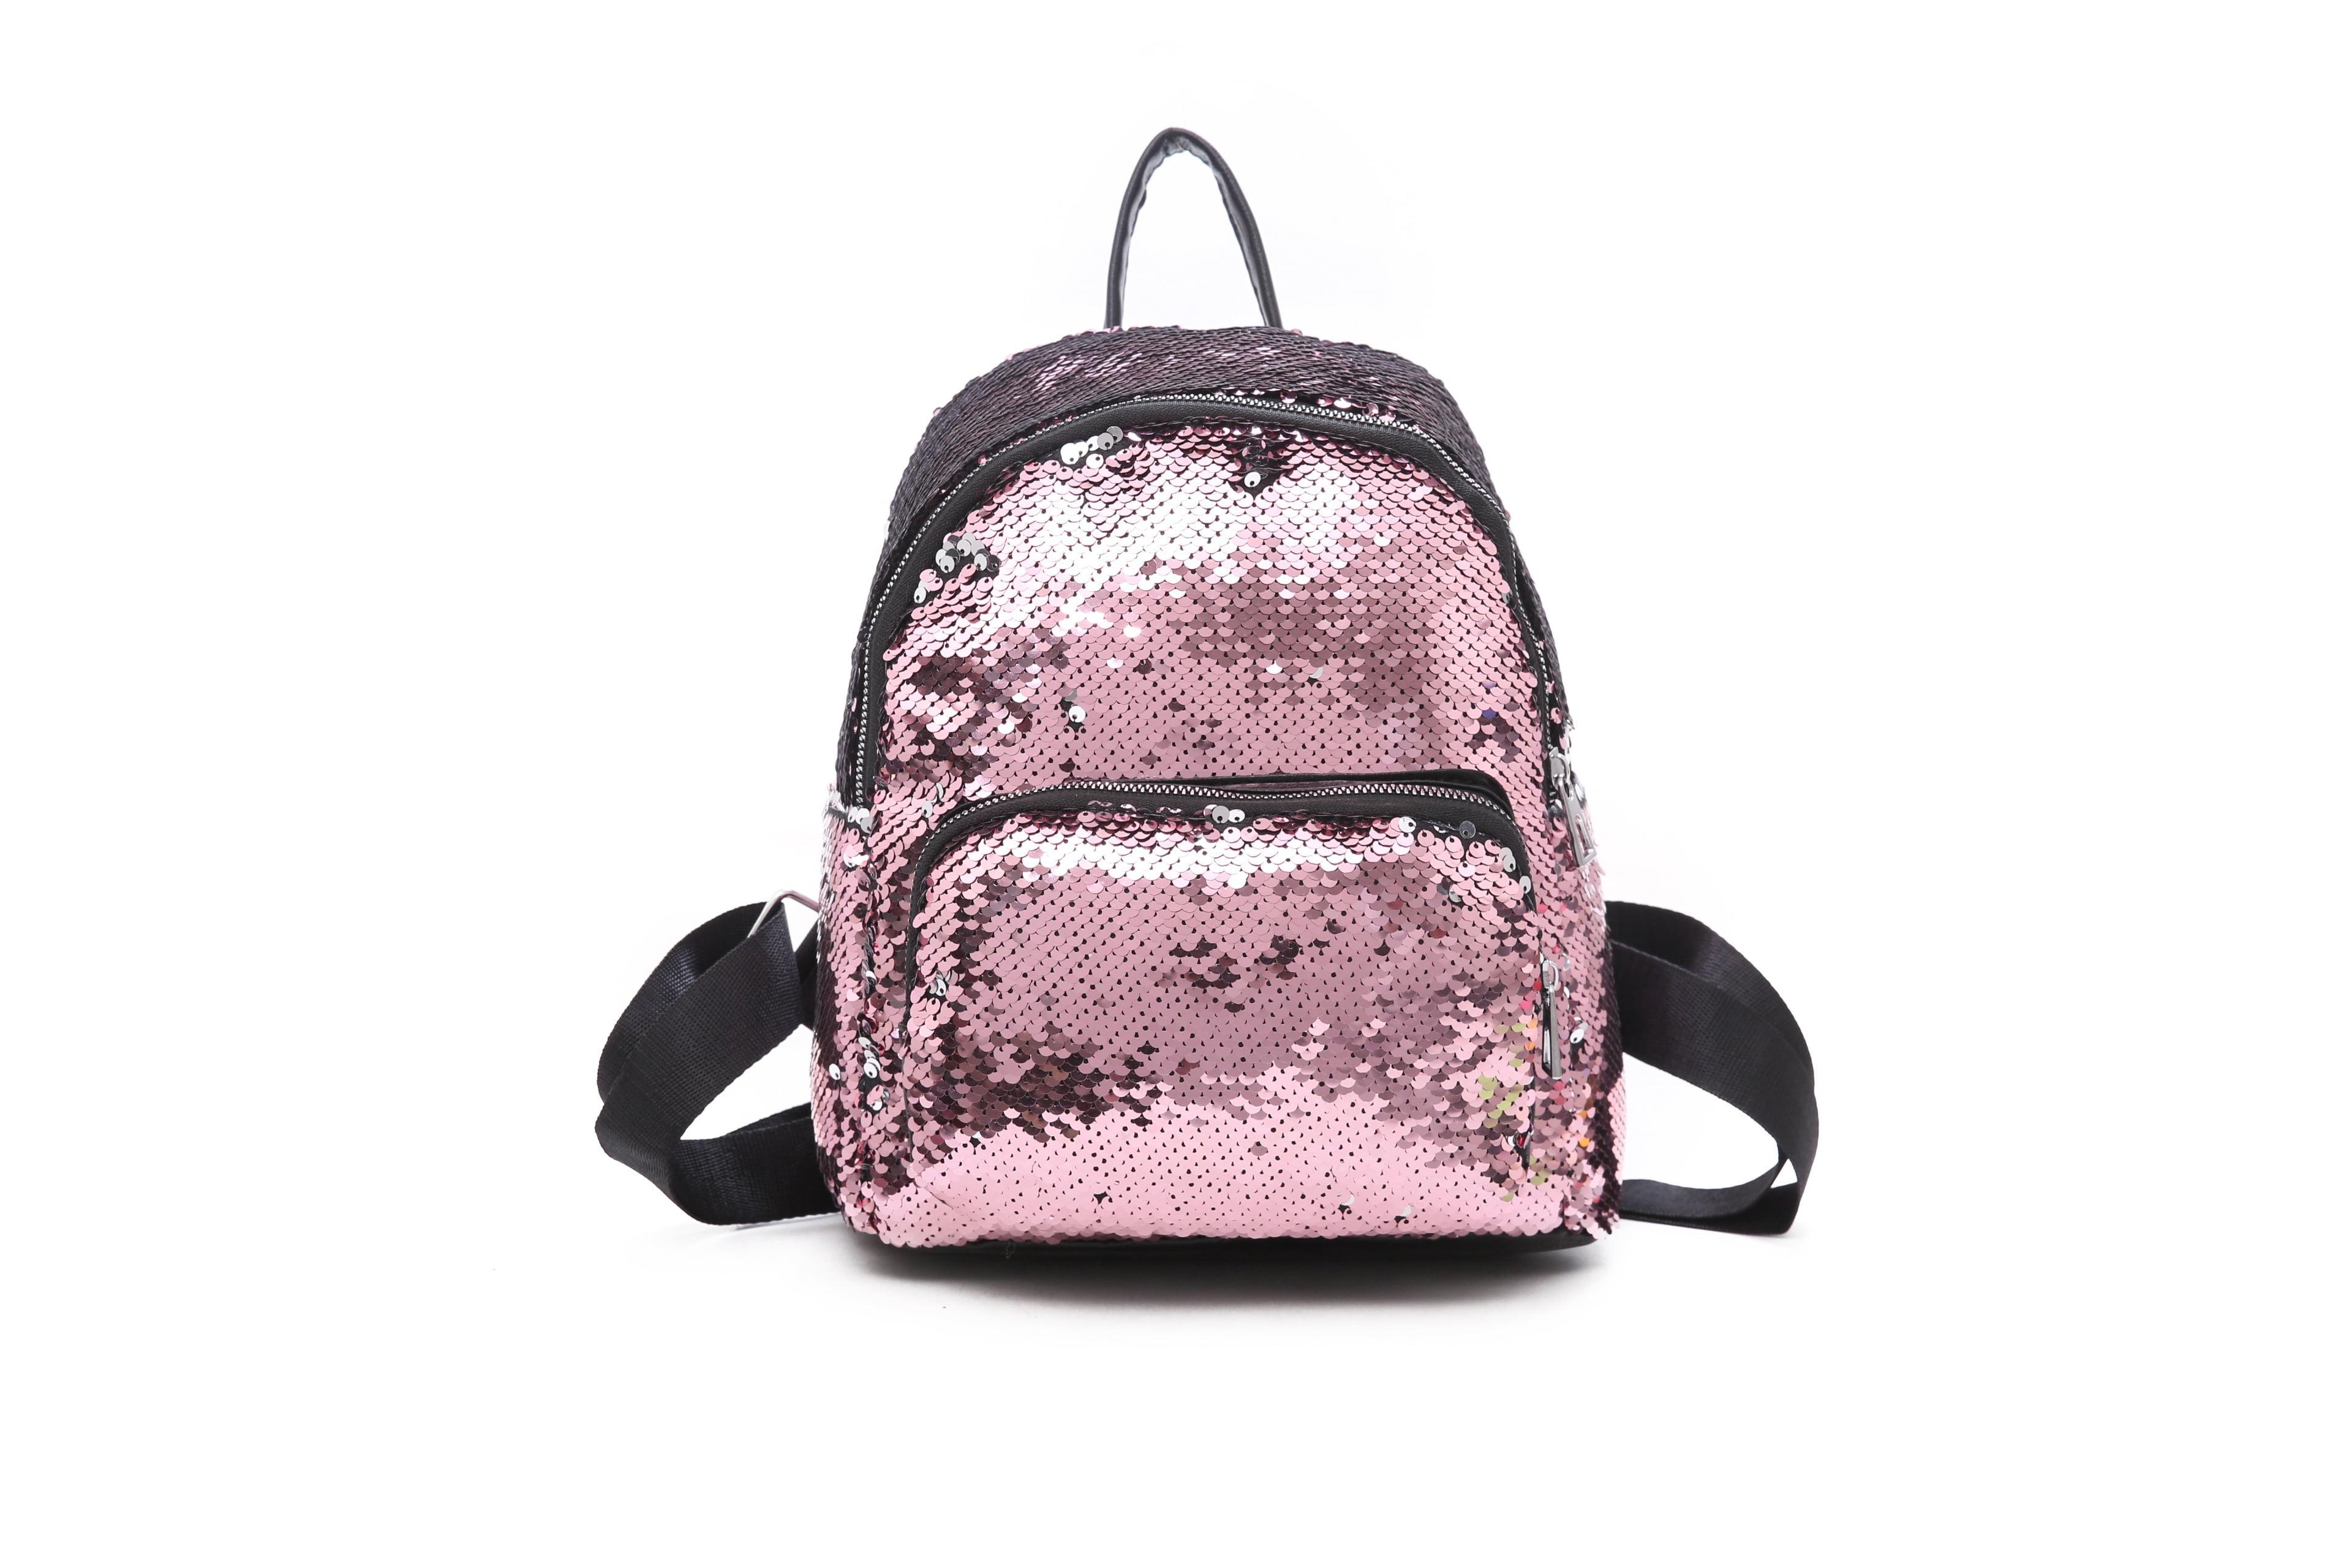 Emmababy - Women Girls Handbag Sequins Glitter Backpack Rucksack ... dcb43a7ffd60